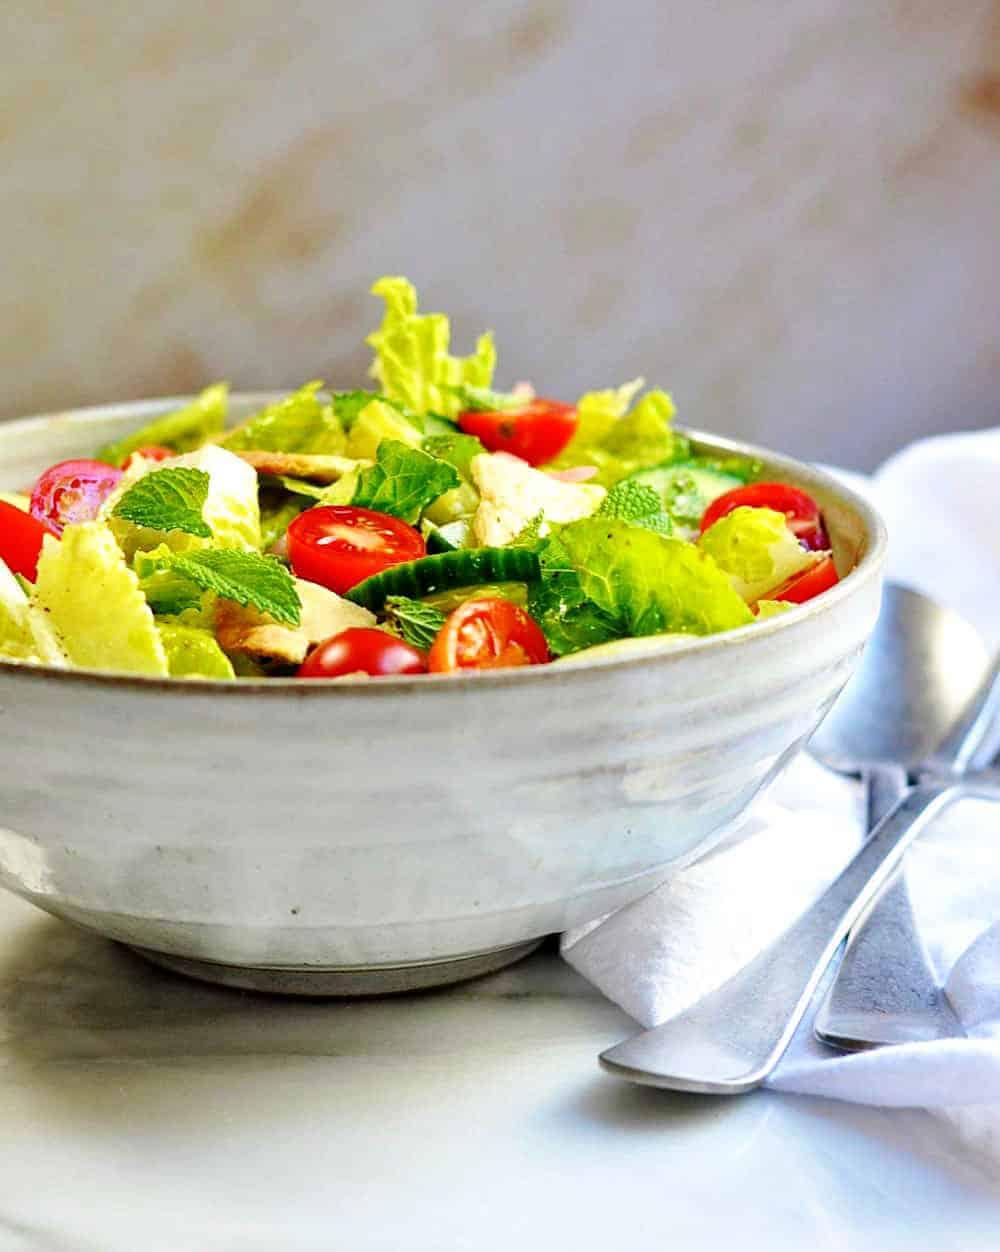 Fattoush-Salad served in a ceramic bowl